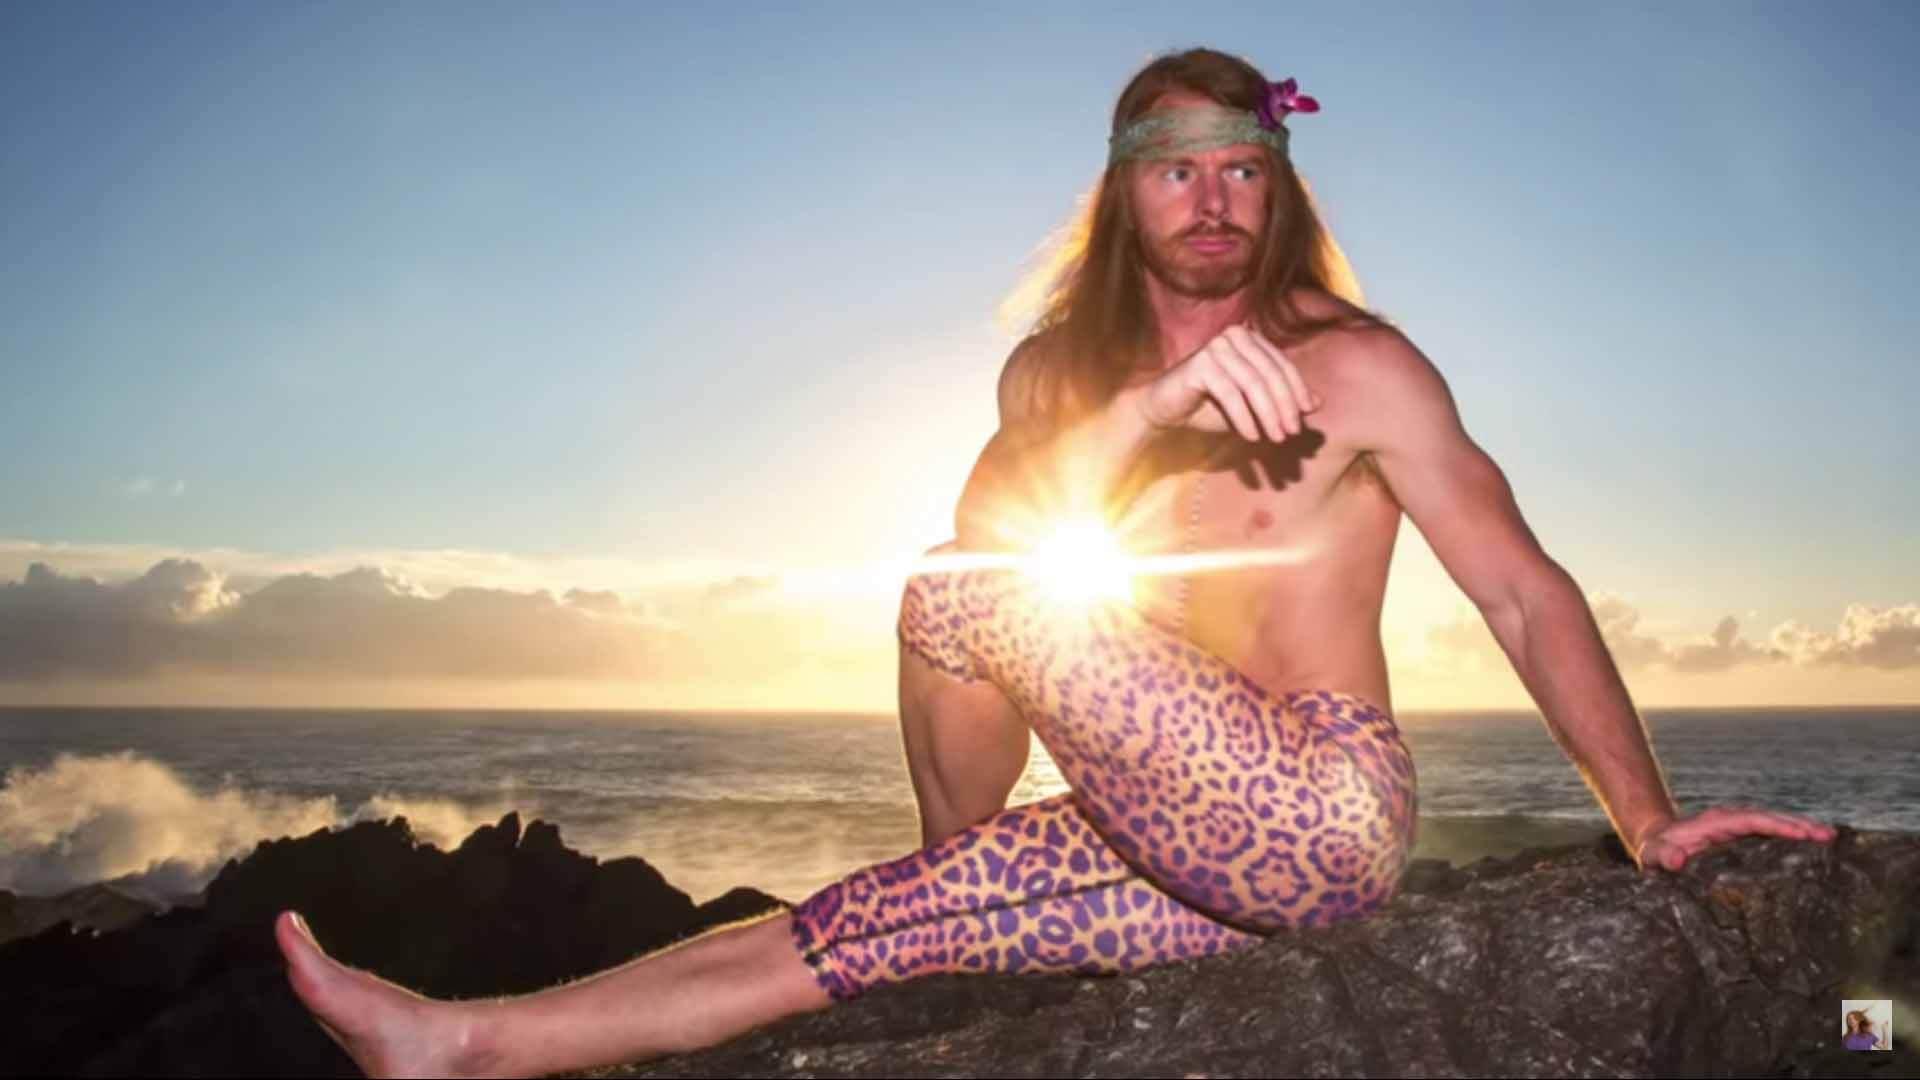 Hilarious Tips on How to Take Instagram Yoga Photos (VIDEO)